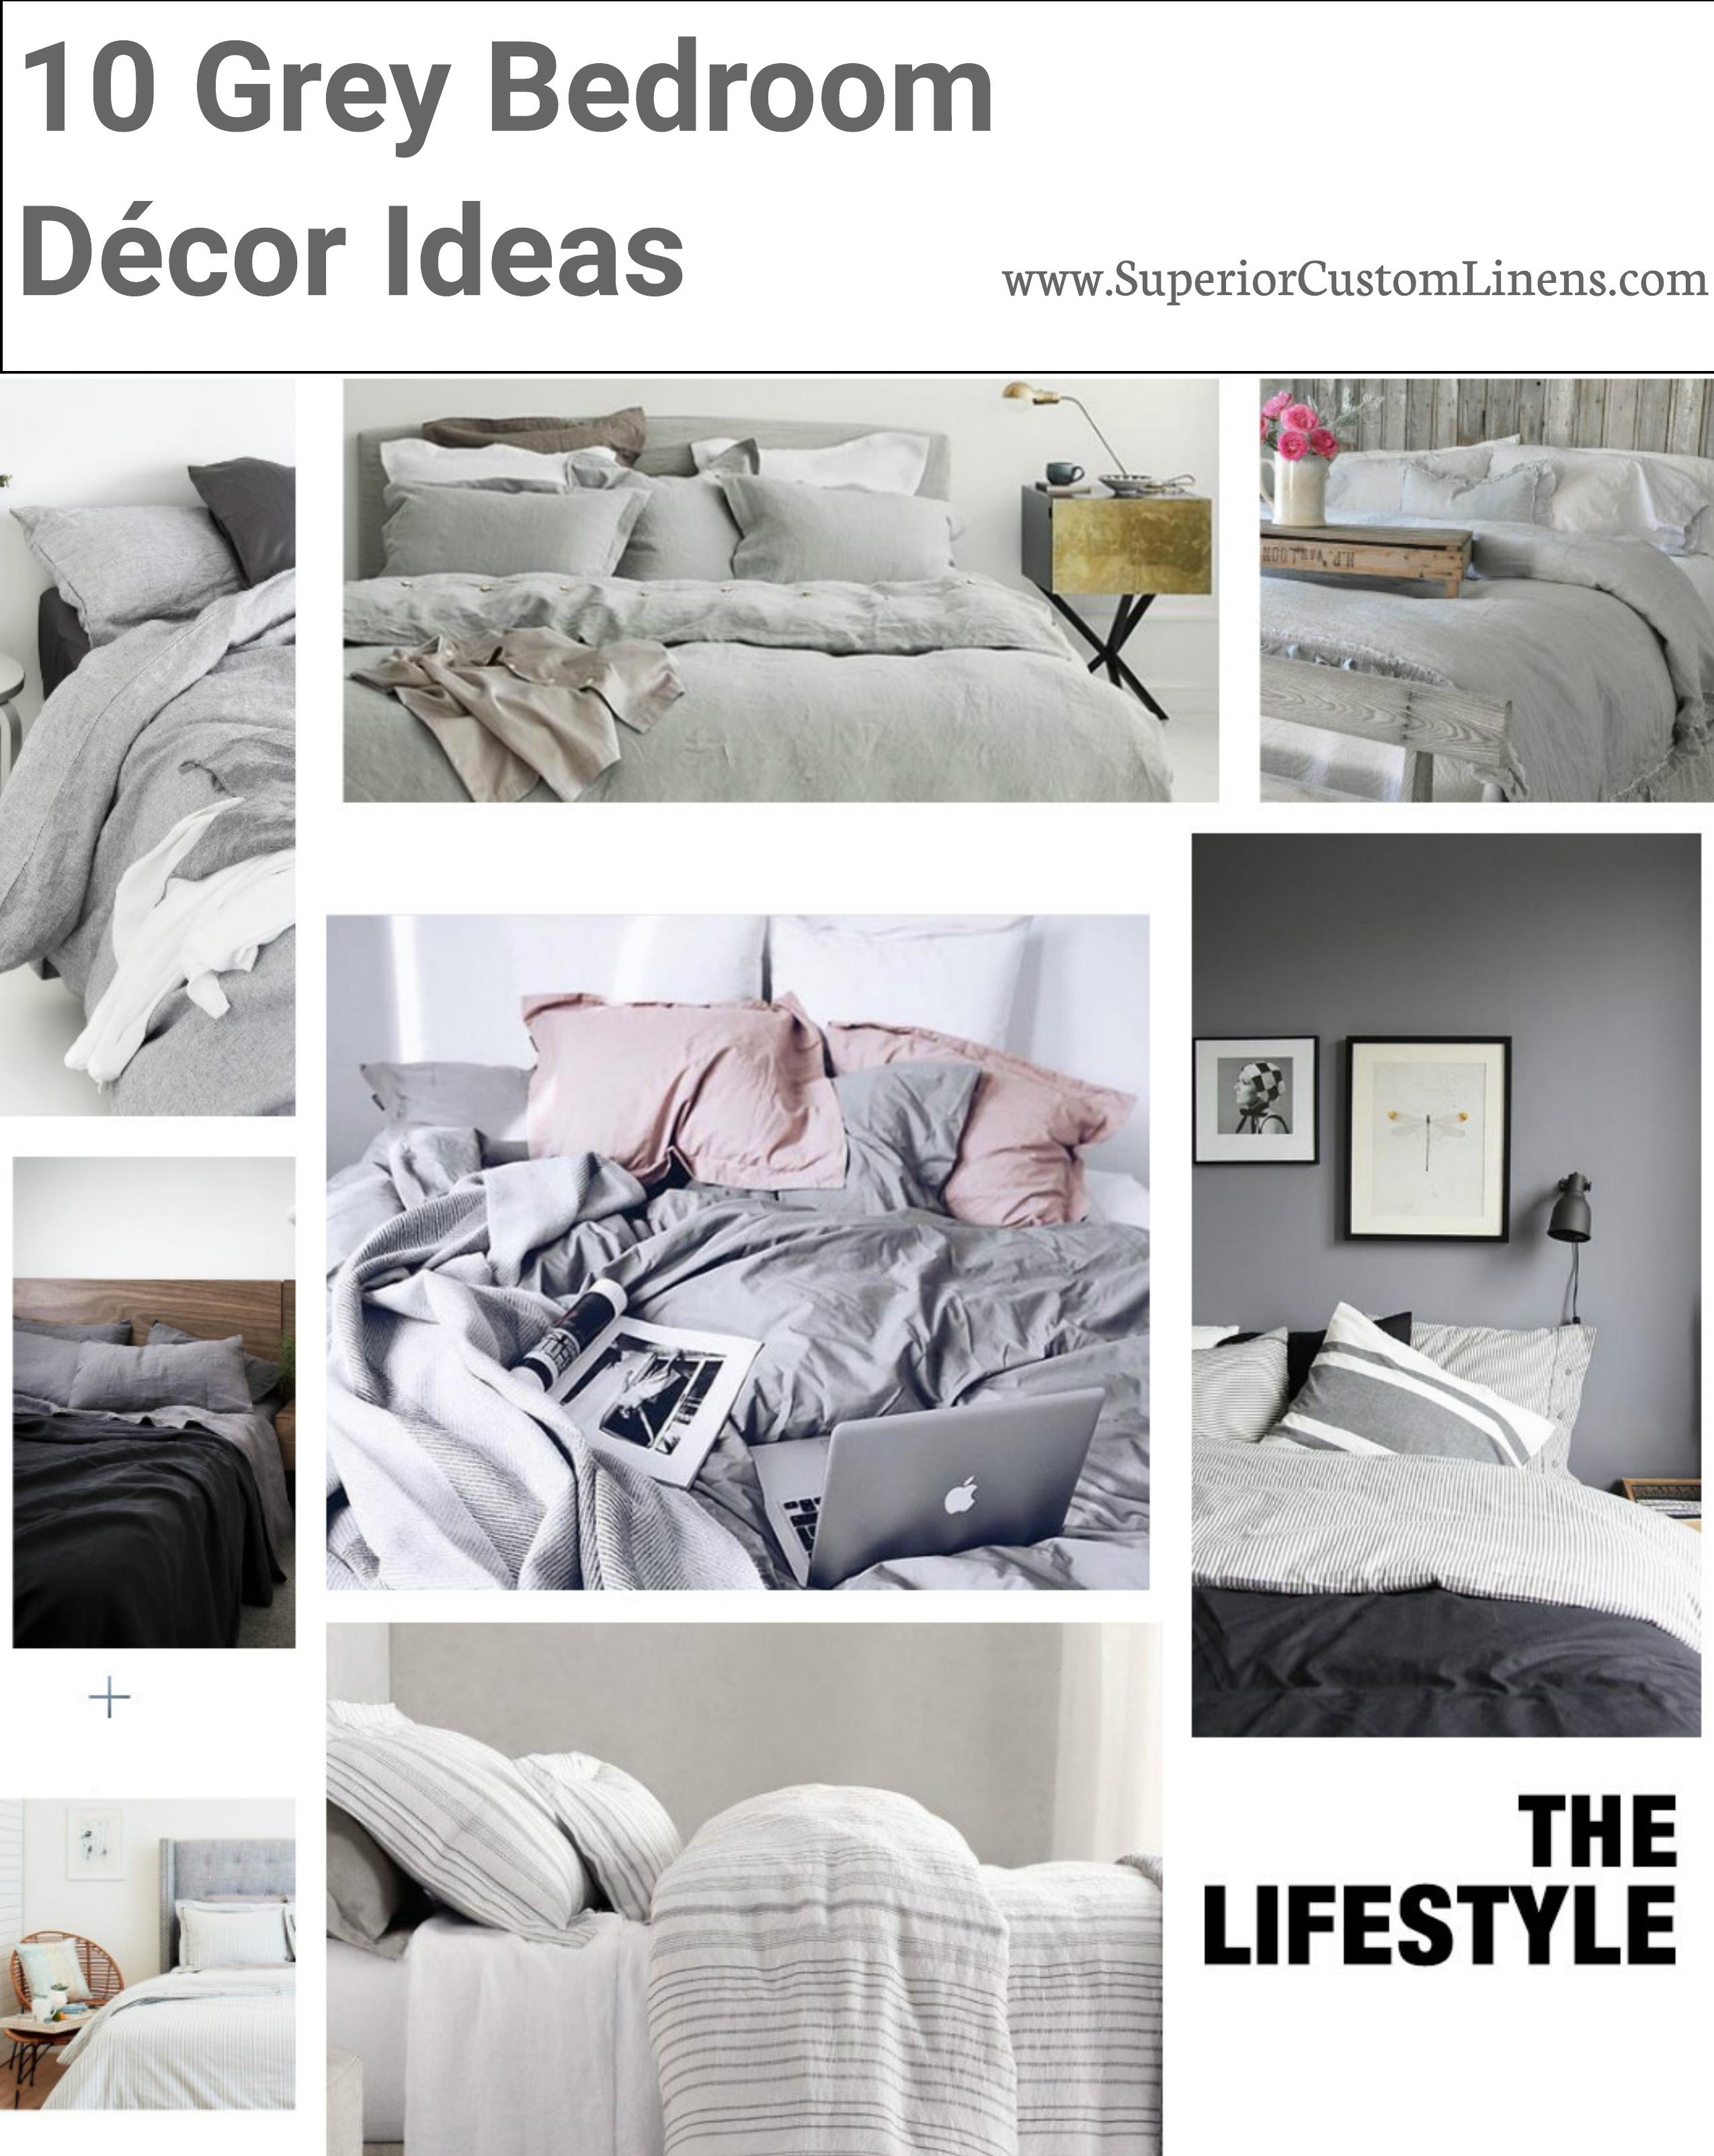 10 Grey Bedroom Decor Ideas Superior Custom Linens